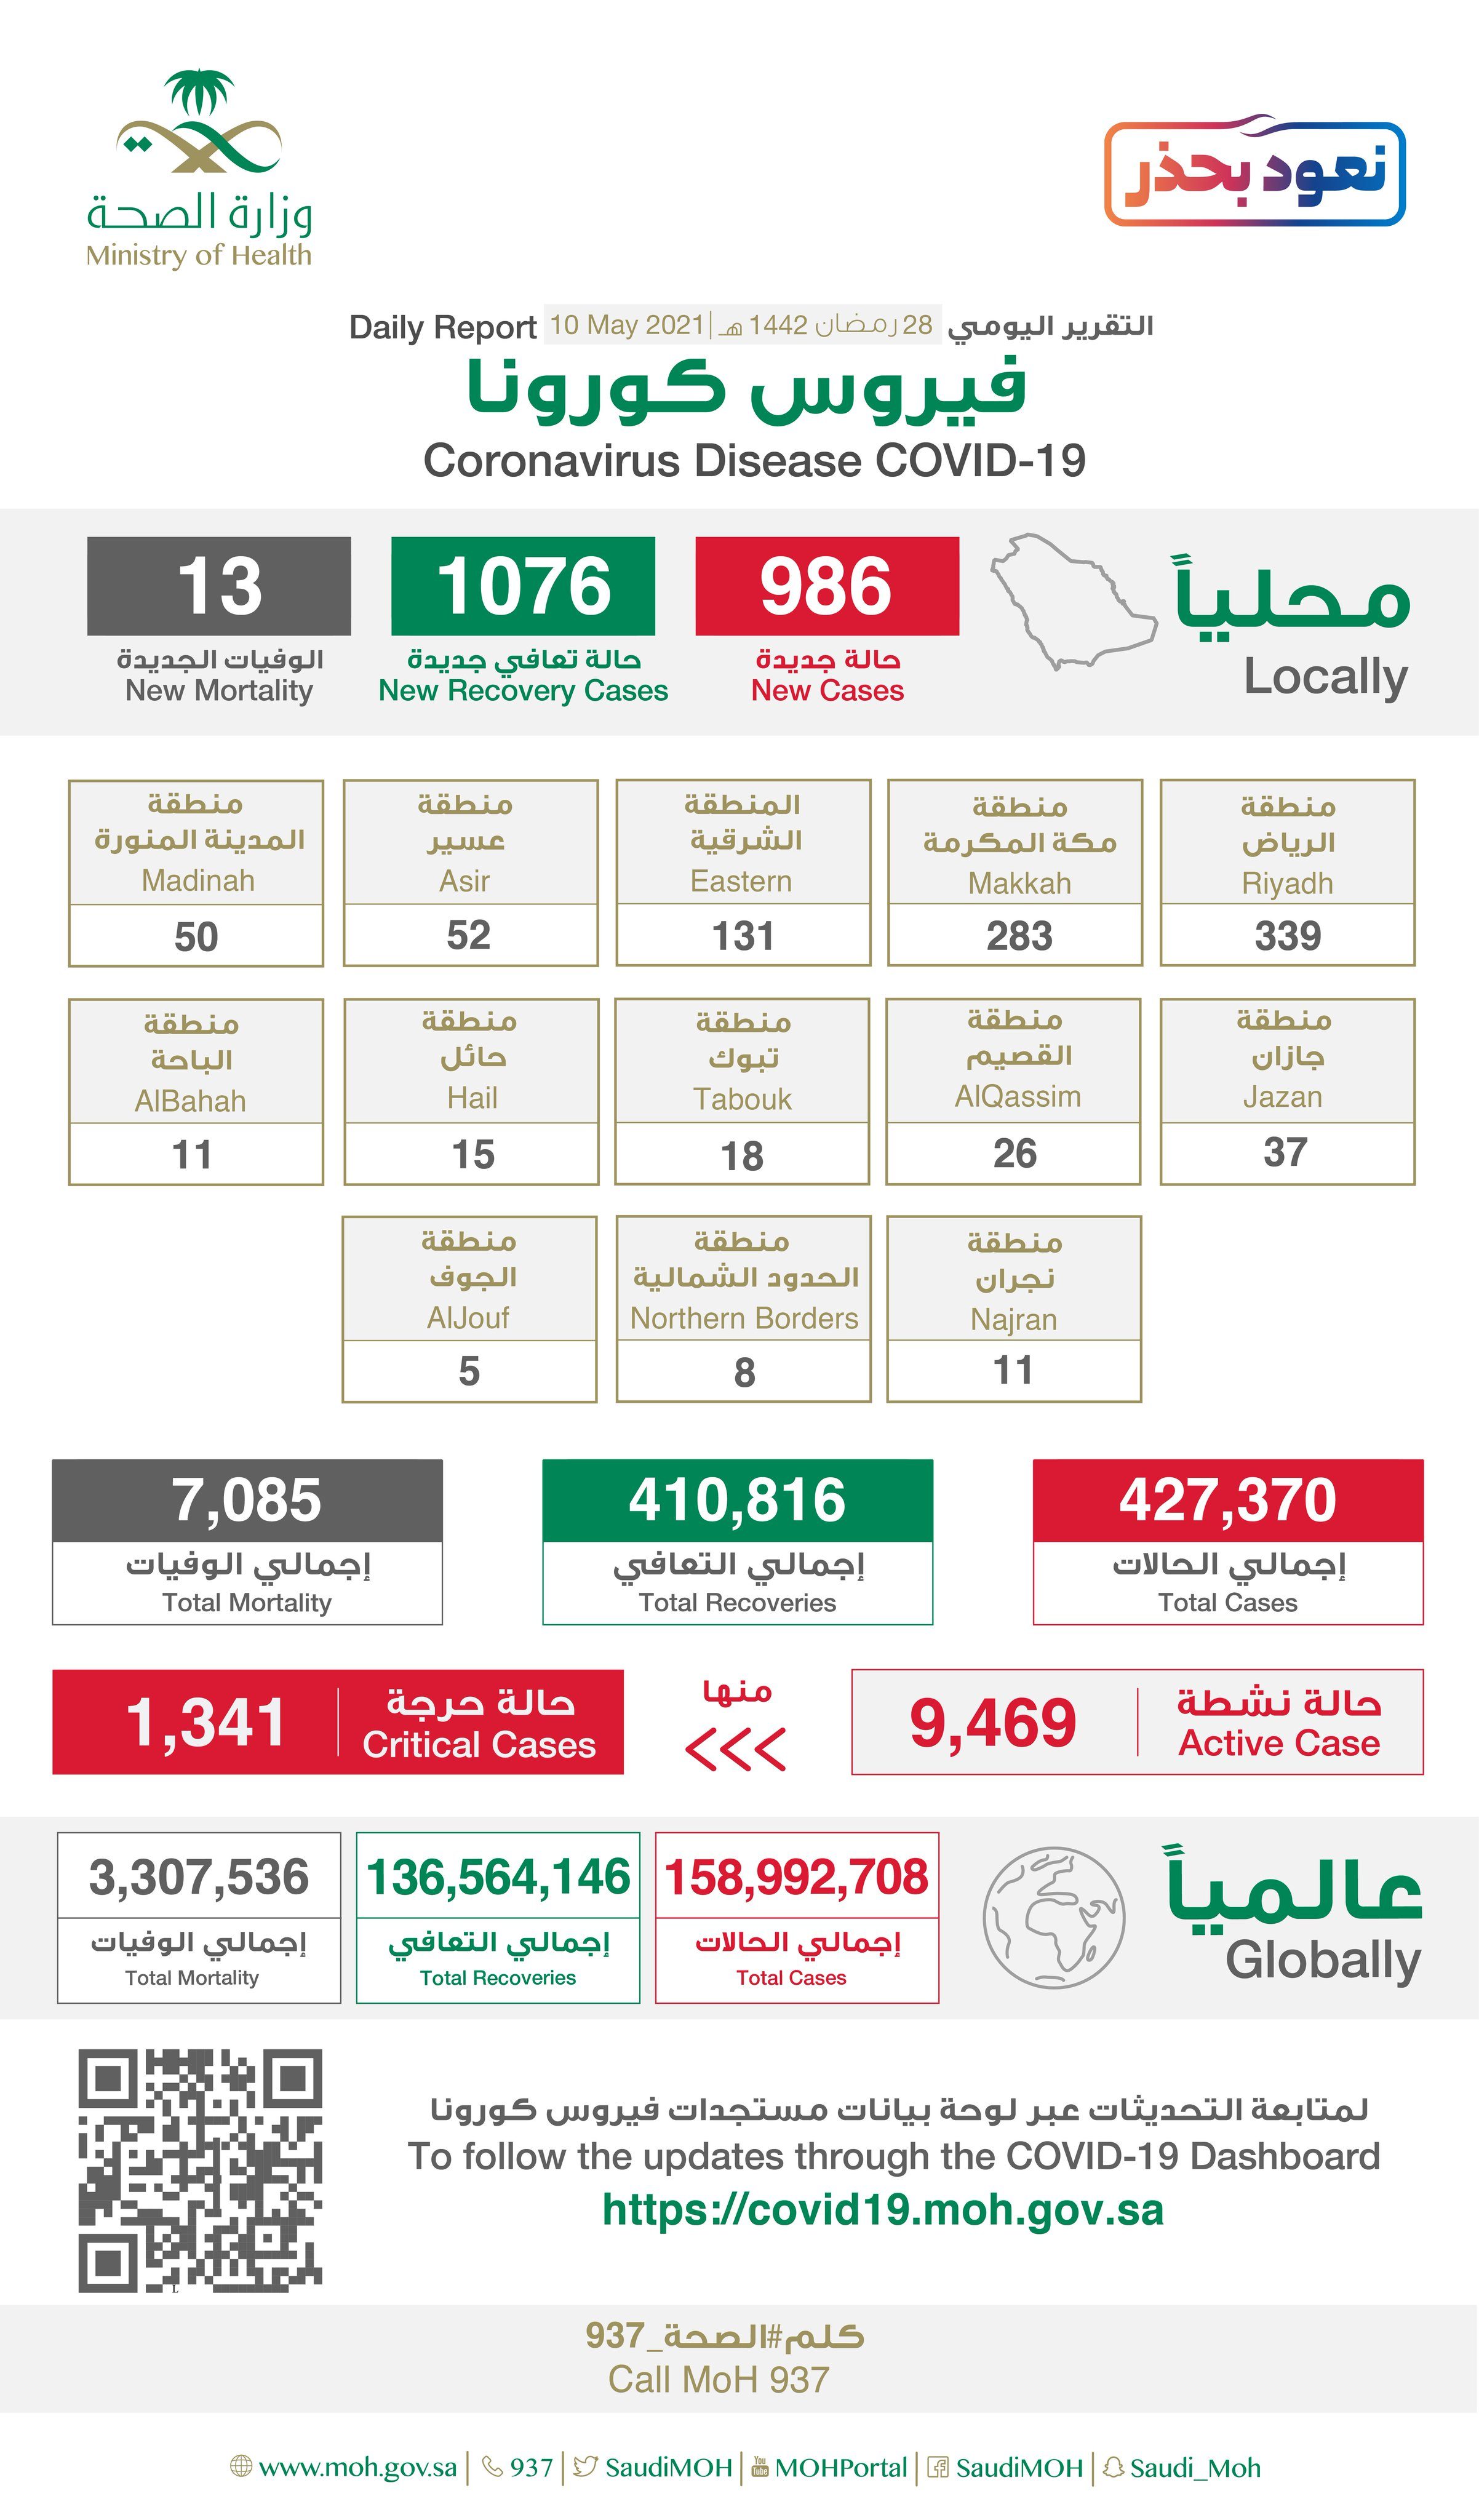 Saudi Arabia Coronavirus : Total Cases :427,370 , New Cases : 986 , Cured : 410,816 , Deaths: 7,085, Active Cases : 9,469